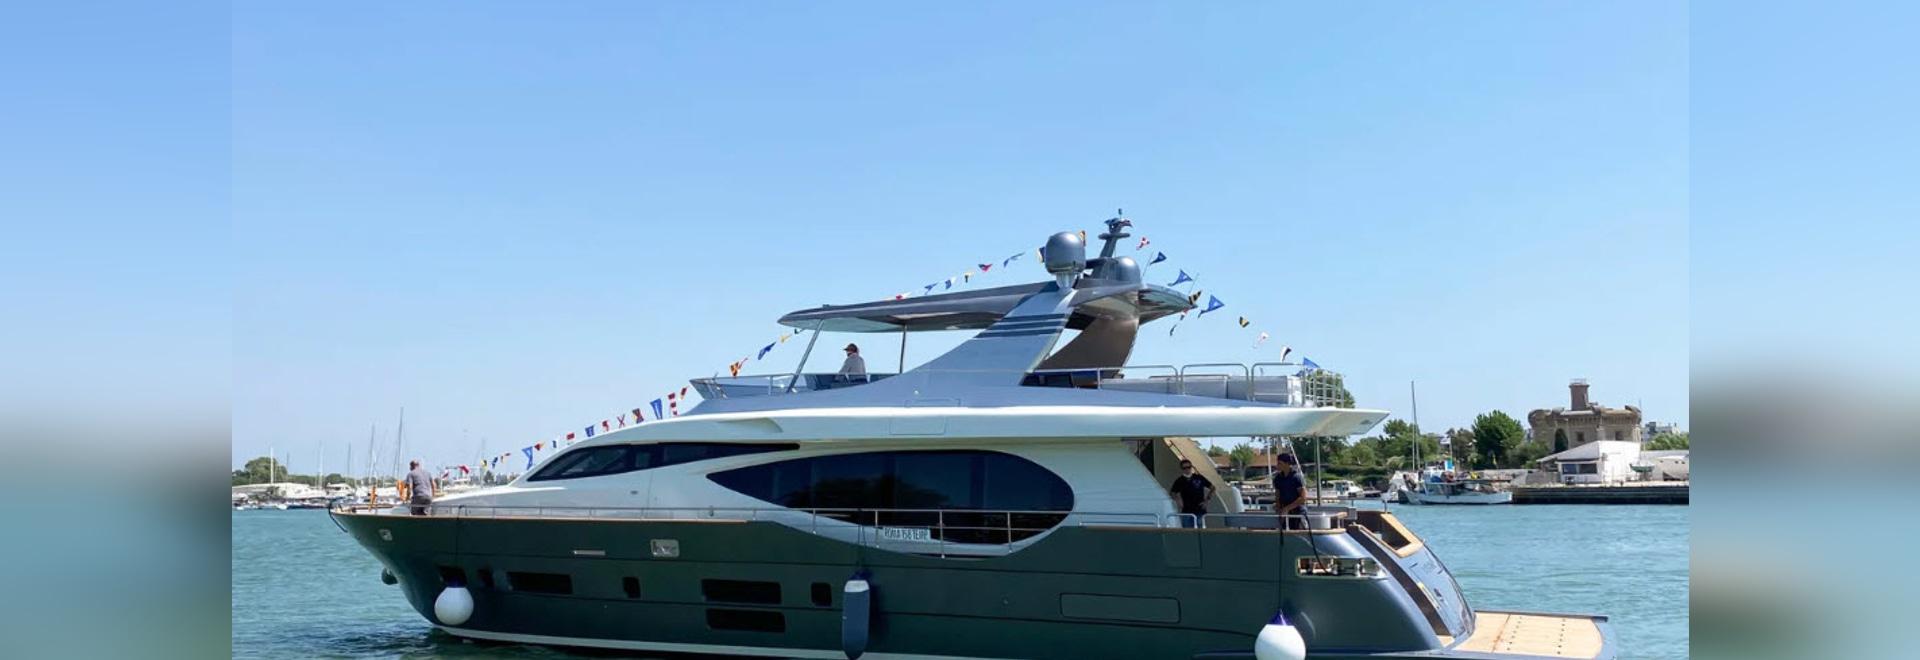 Canados 888 Evo Superyacht Passion VI Delivered